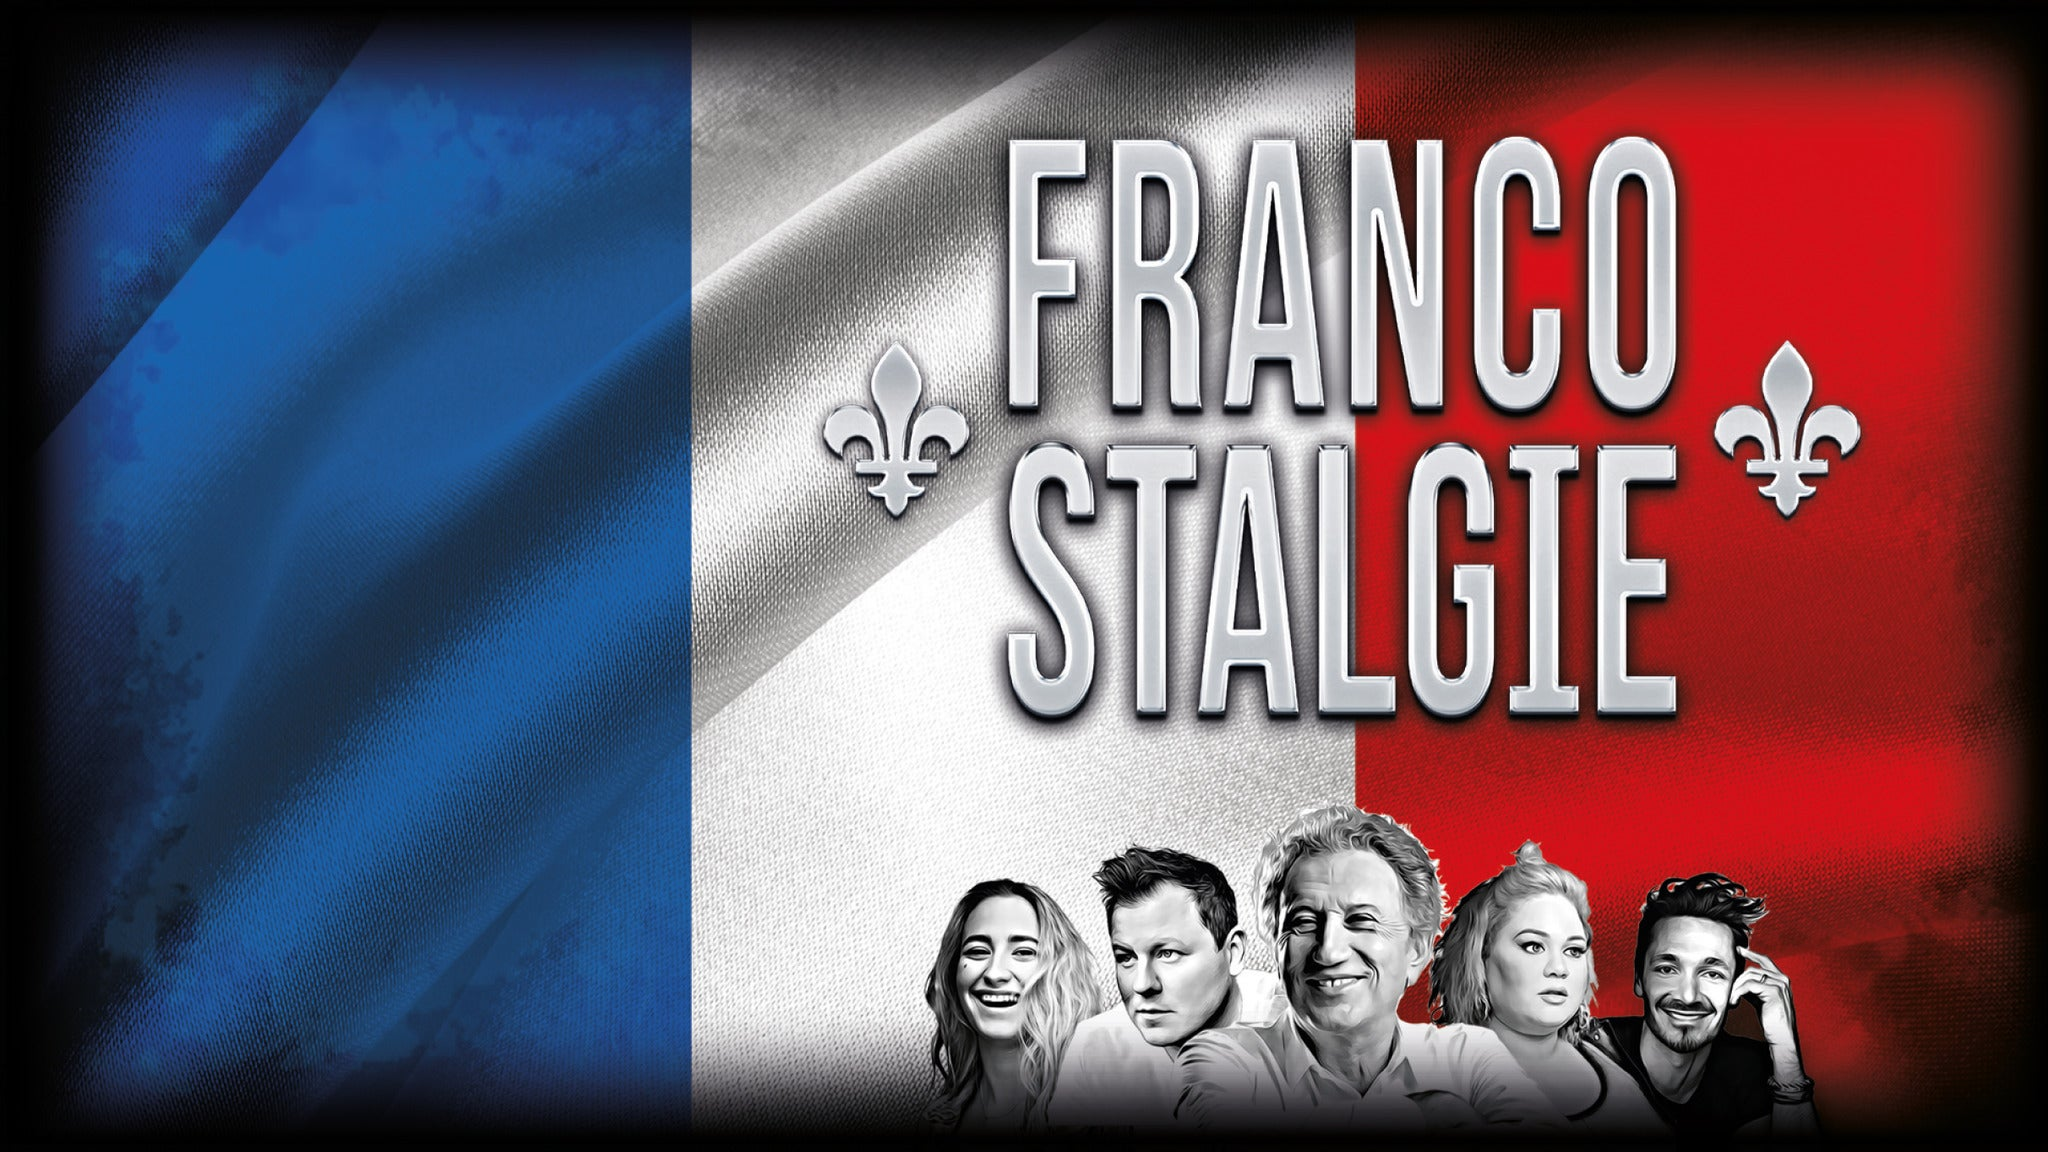 Francostalgie